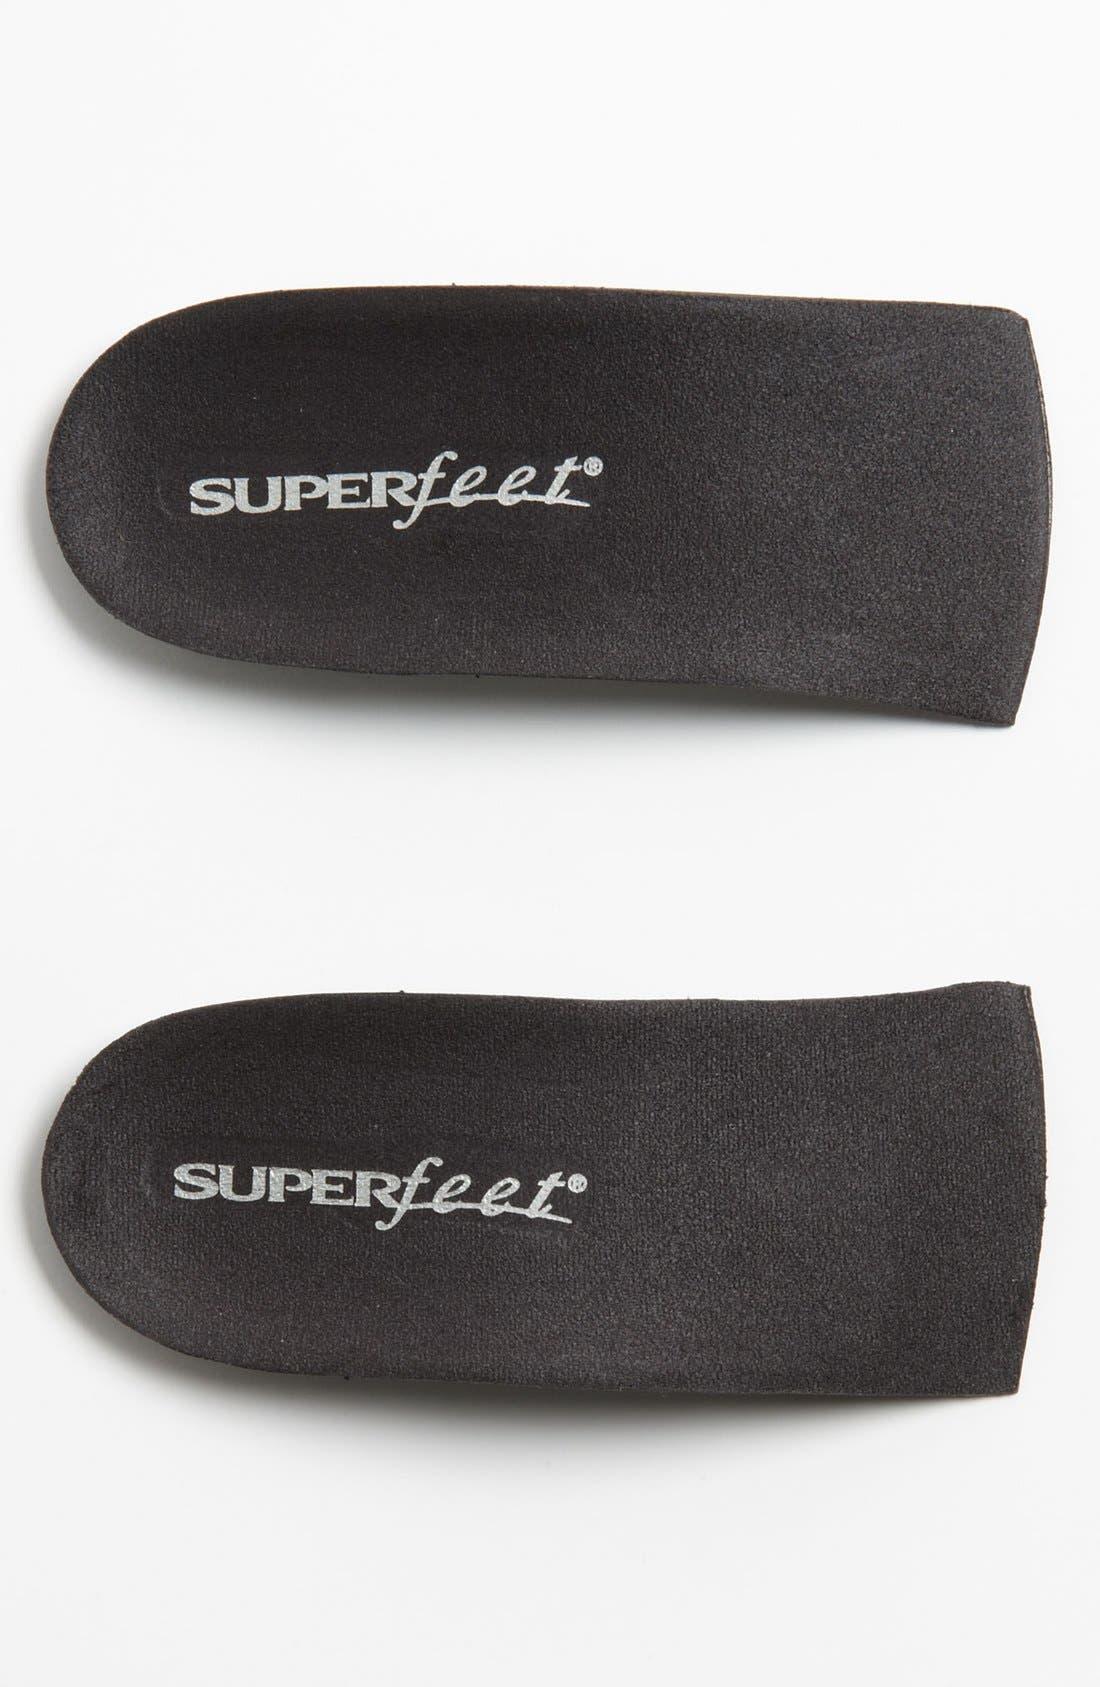 Alternate Image 1 Selected - Superfeet 'Delux' High Heel Three-Quarter Insoles